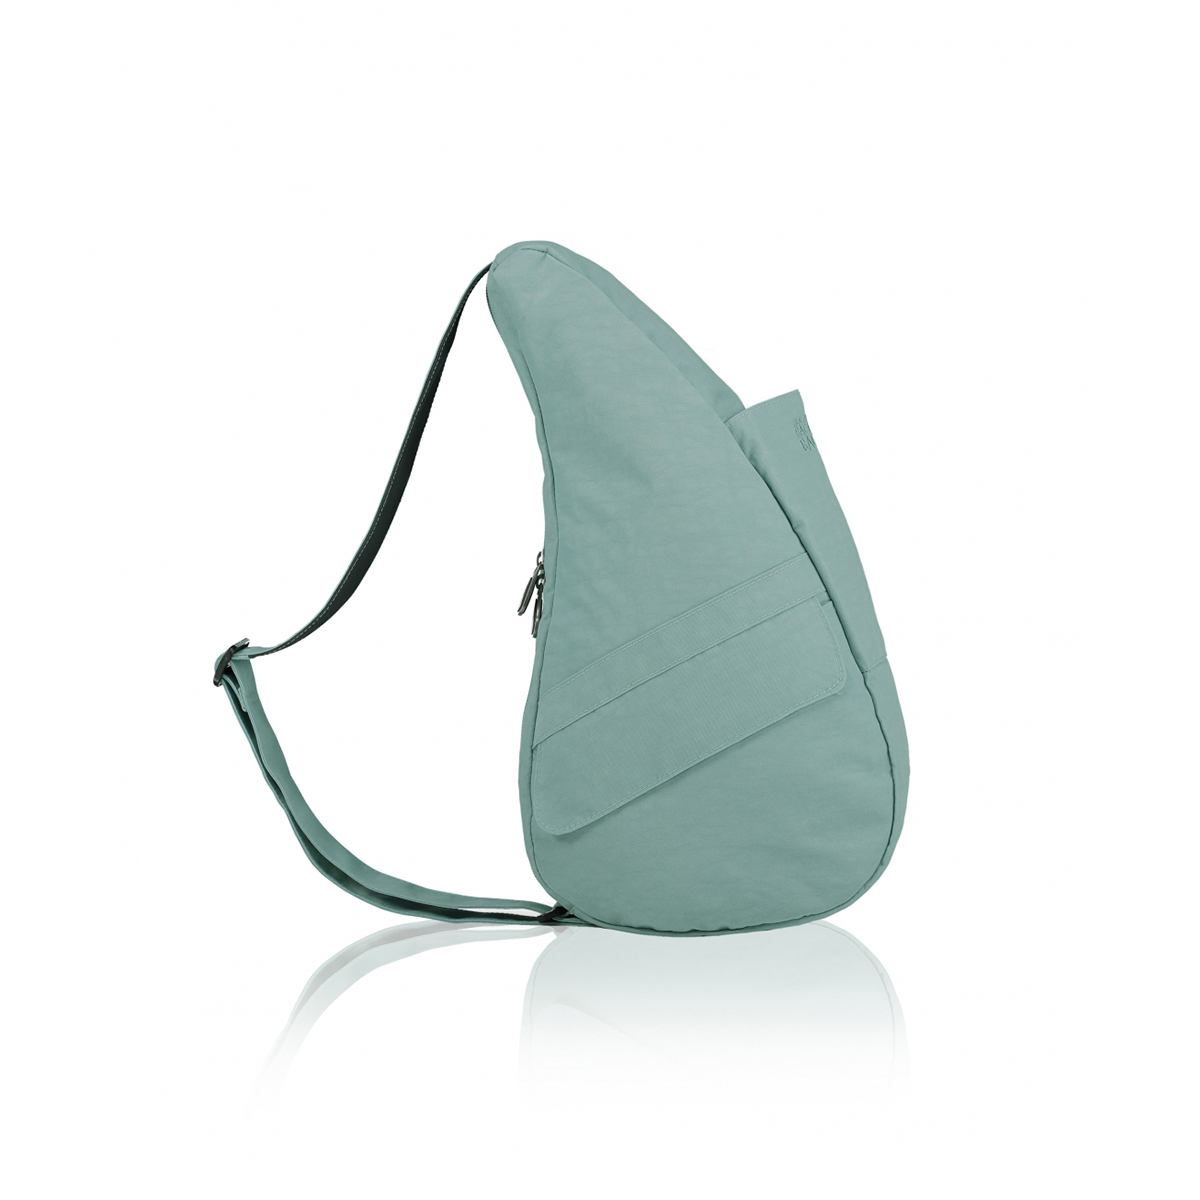 Healthy Back Bag/ヘルシーバックバッグ/ショルダーバッグ/ボディバッグ/旅行バッグ/軽量/レディース/メンズ 《限定ポーチ付》 公式ストア ヘルシーバックバッグ テクスチャードナイロン Sサイズ アクア